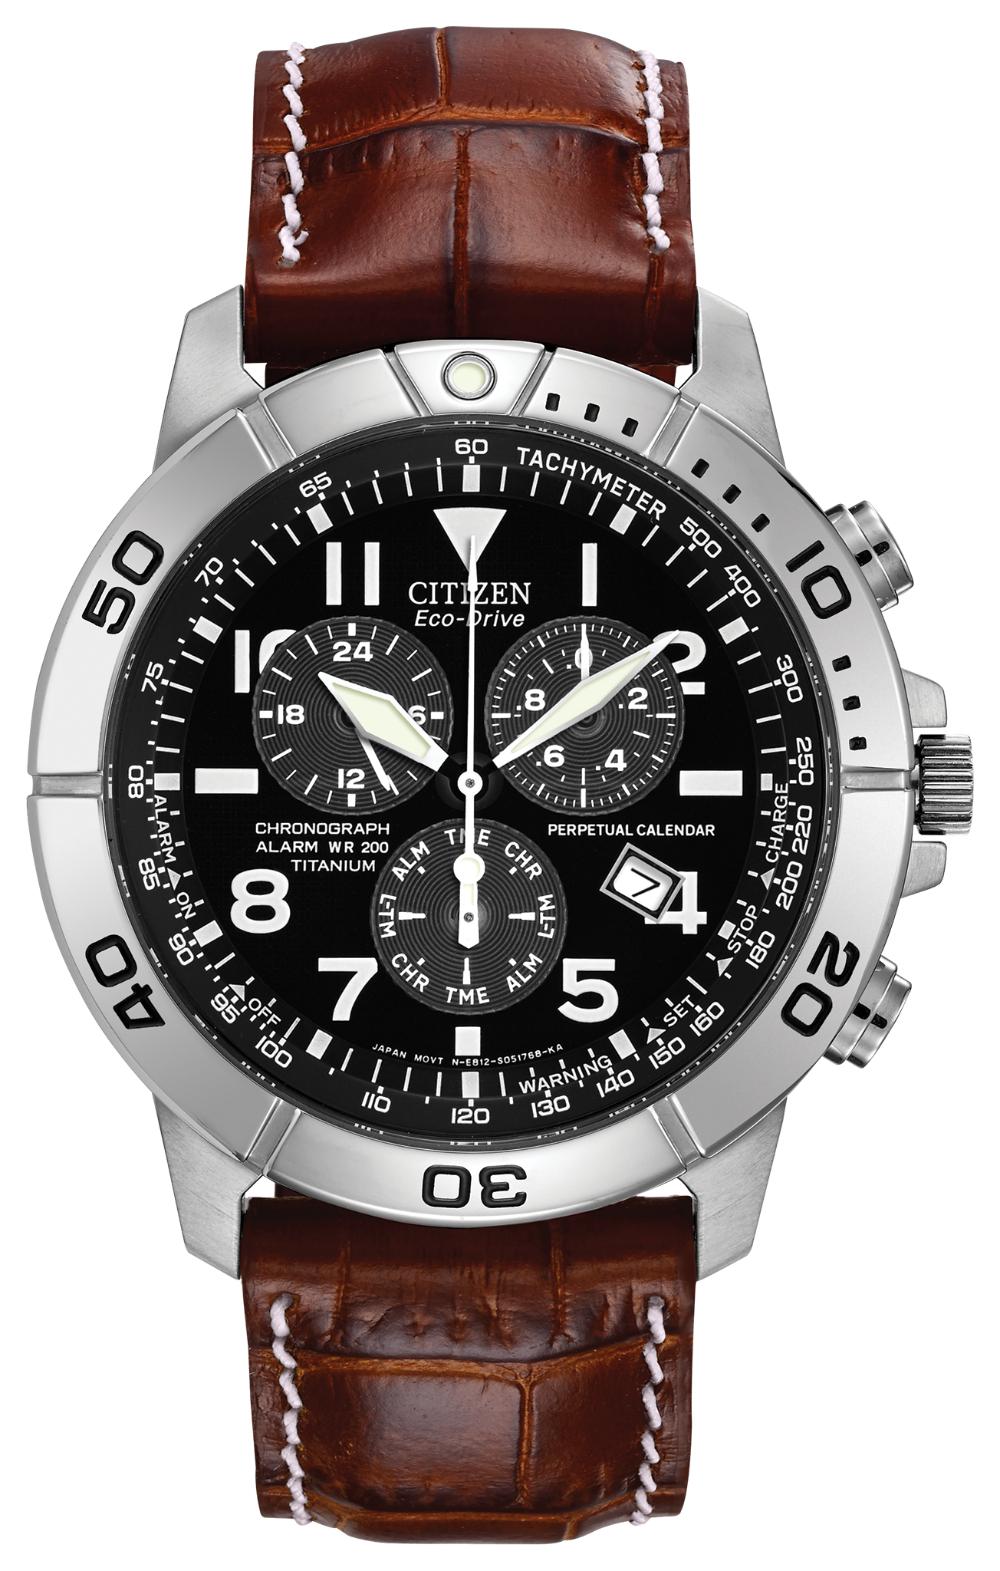 Citizen Eco-Drive men's chronograph titanium watch, £191.20 at Fraser Hart